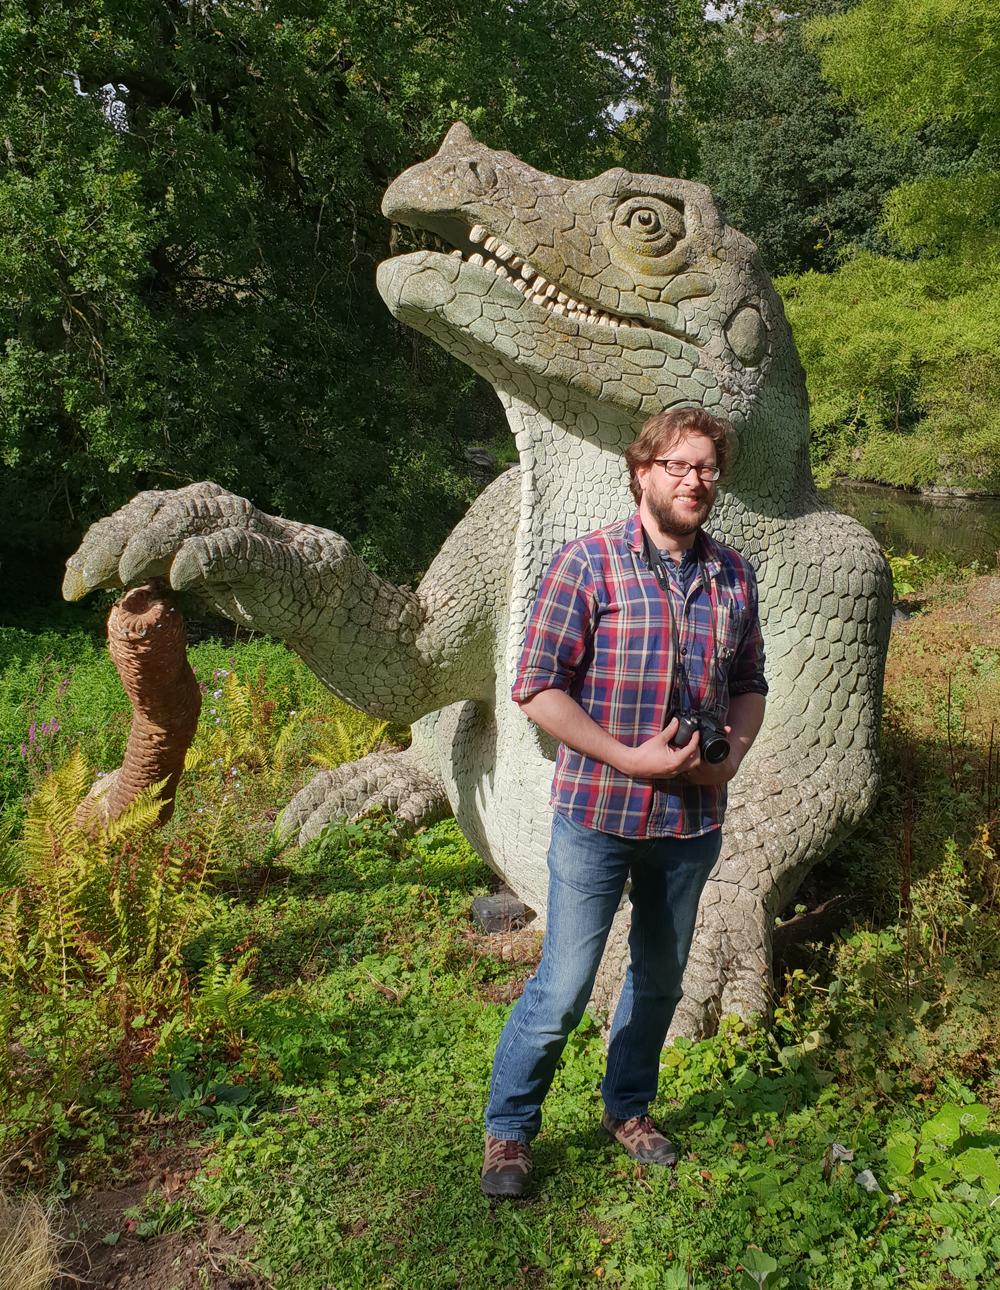 CP-Sept-2018-Darren-and-Iguanodon-1000-px-tiny-Dec-2018-Darren-Naish-Tetrapod-Zoology.jpg